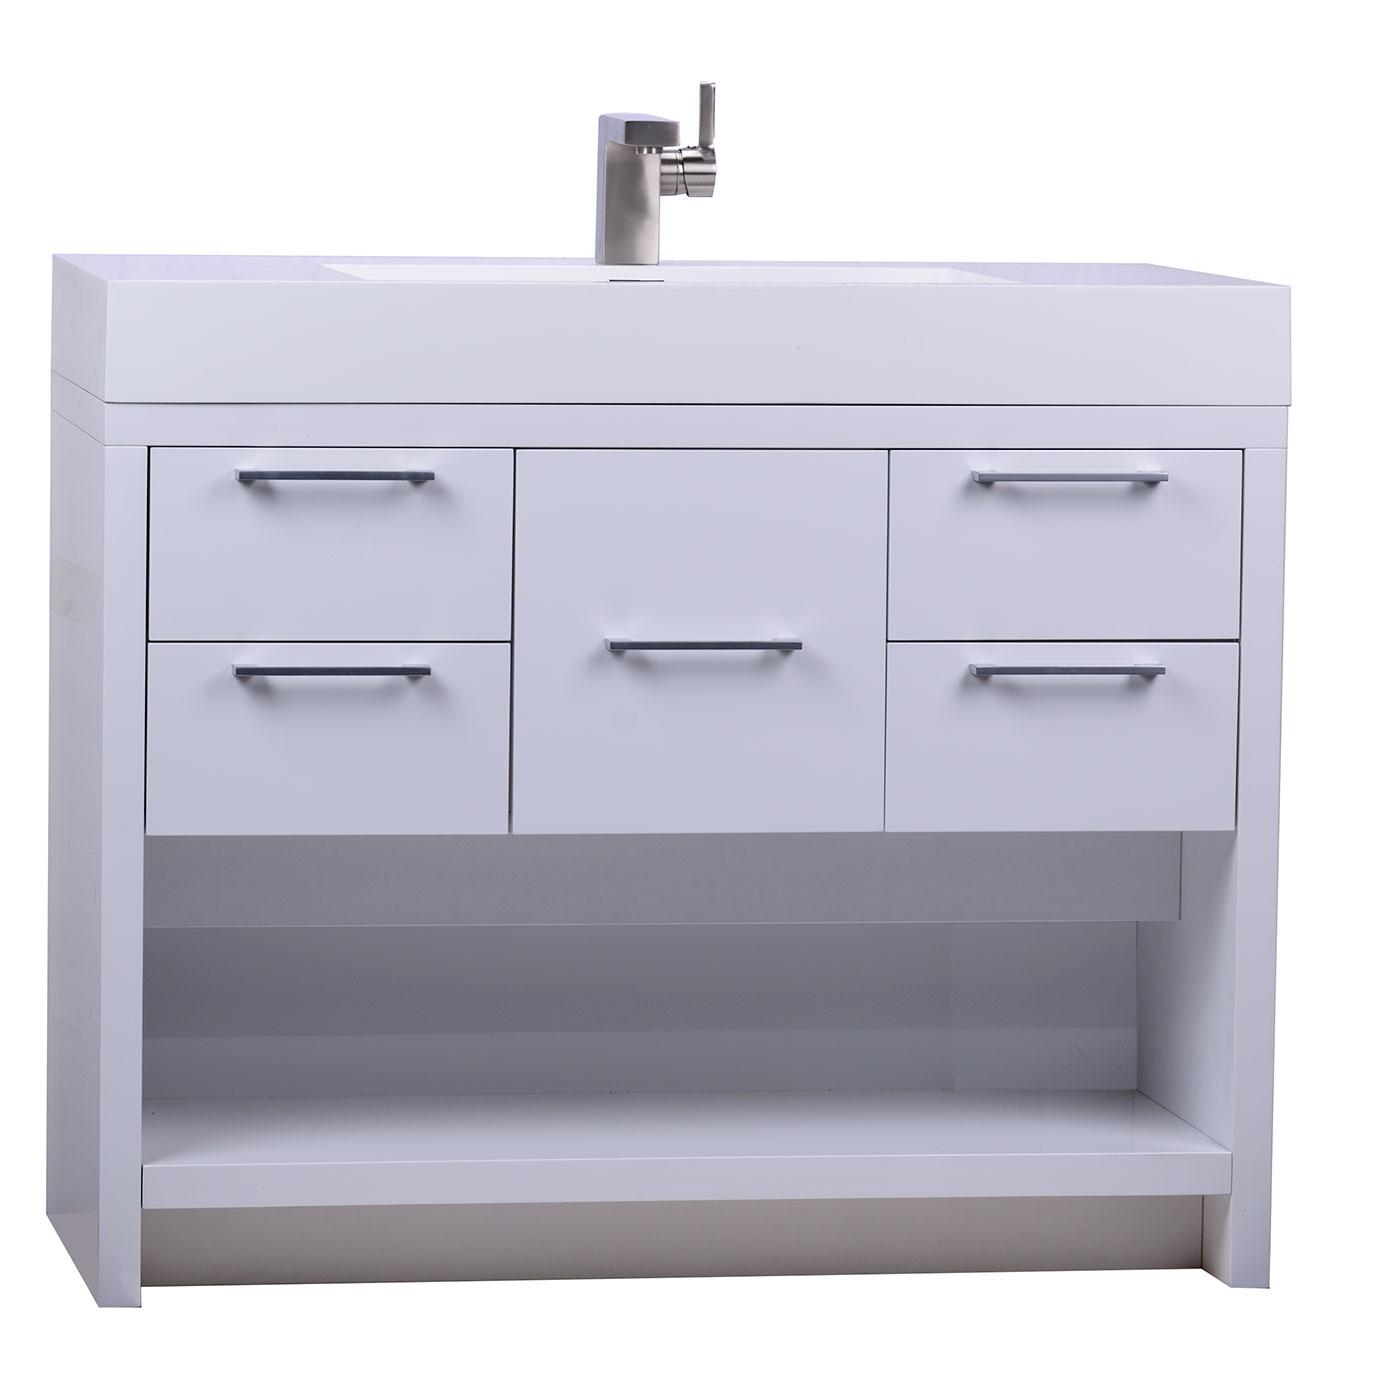 LODI 40 Inch Modern Bathroom Vanity High Gloss Whtie